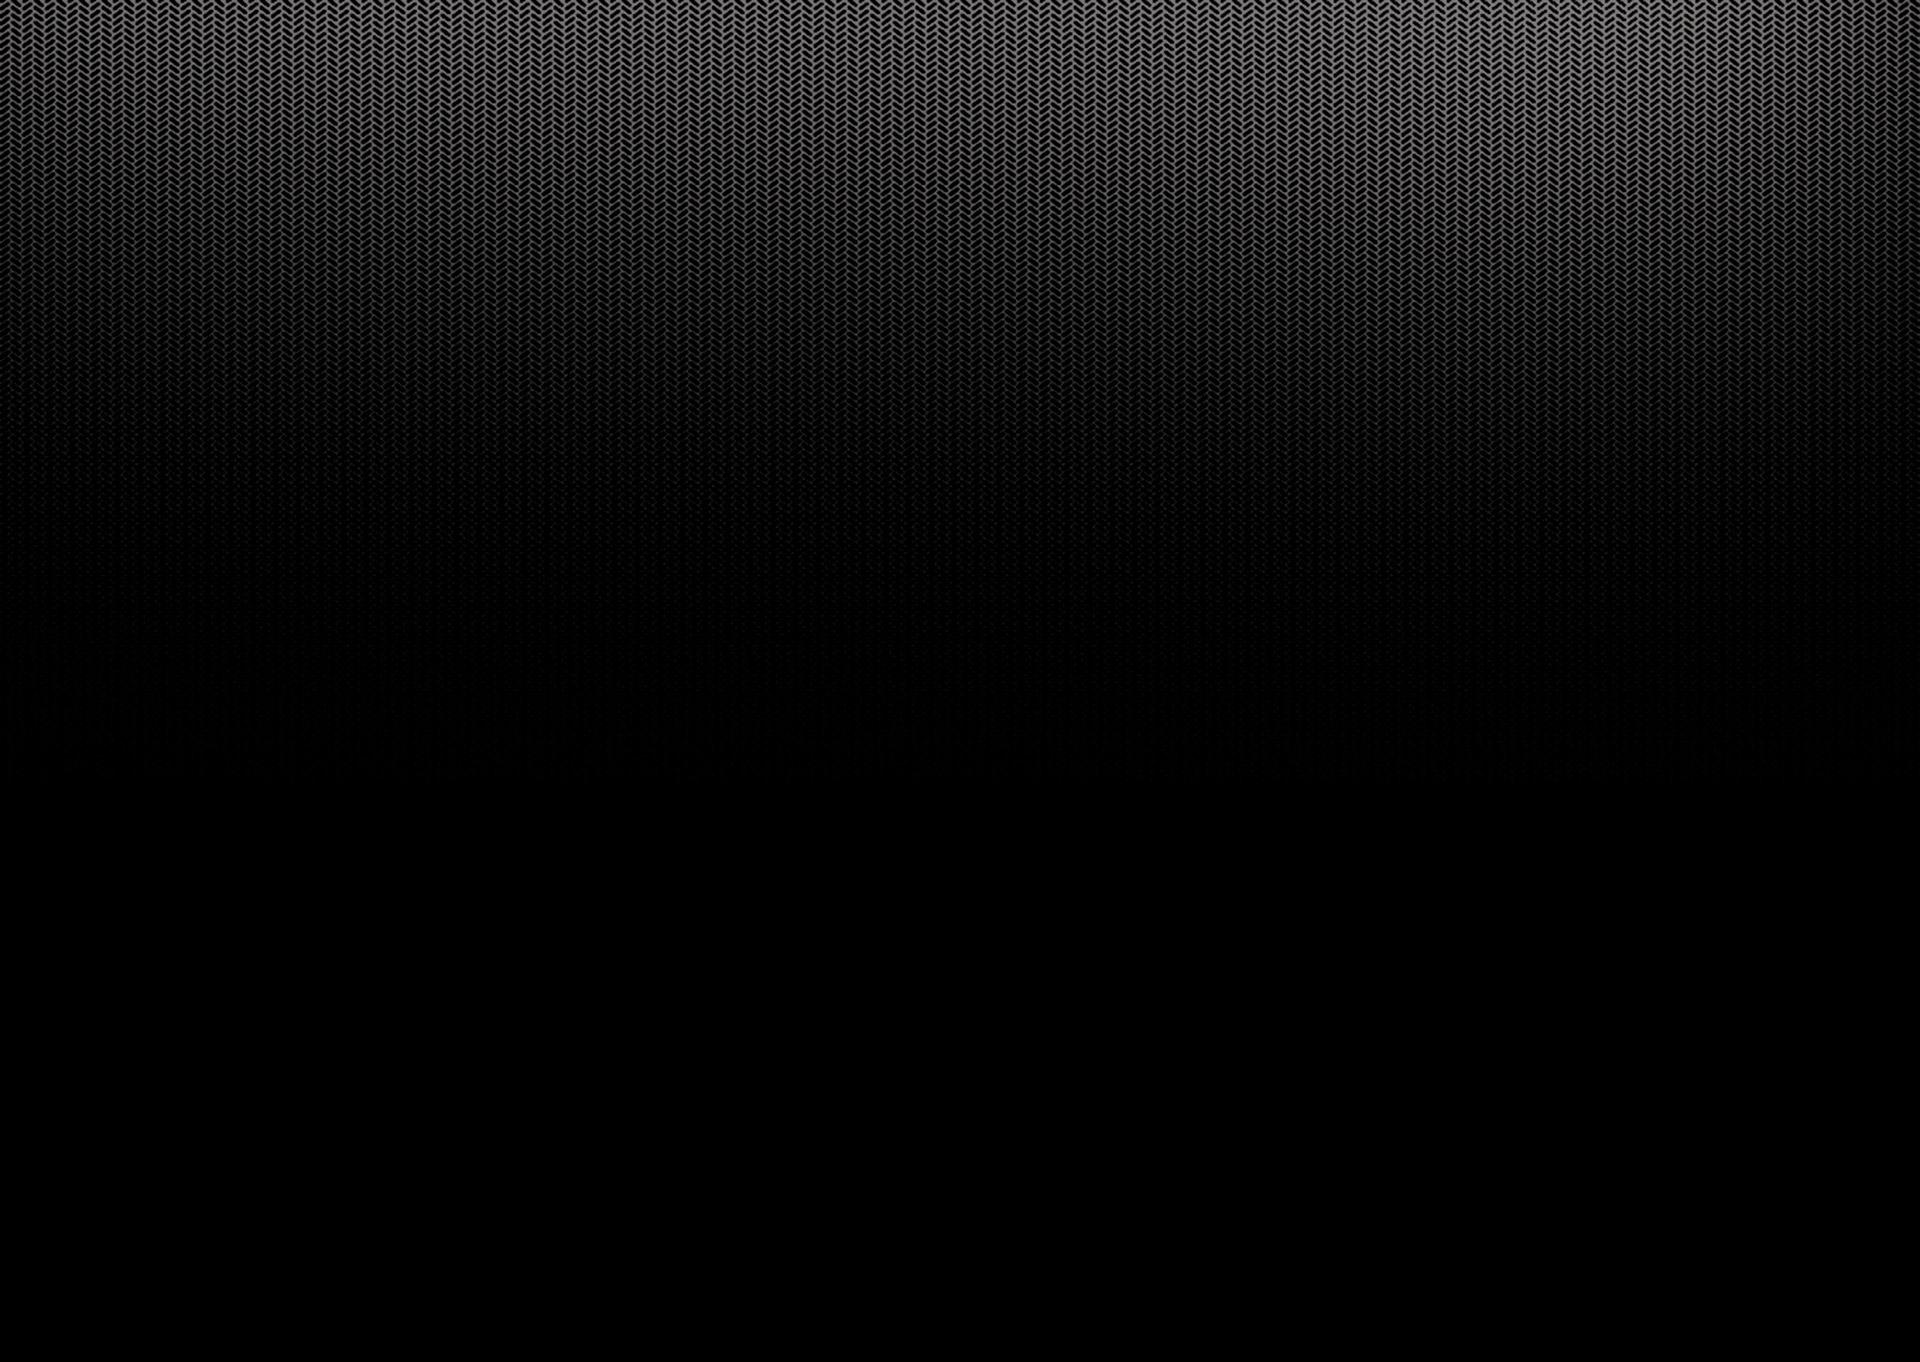 black background   Large Images 1920x1362